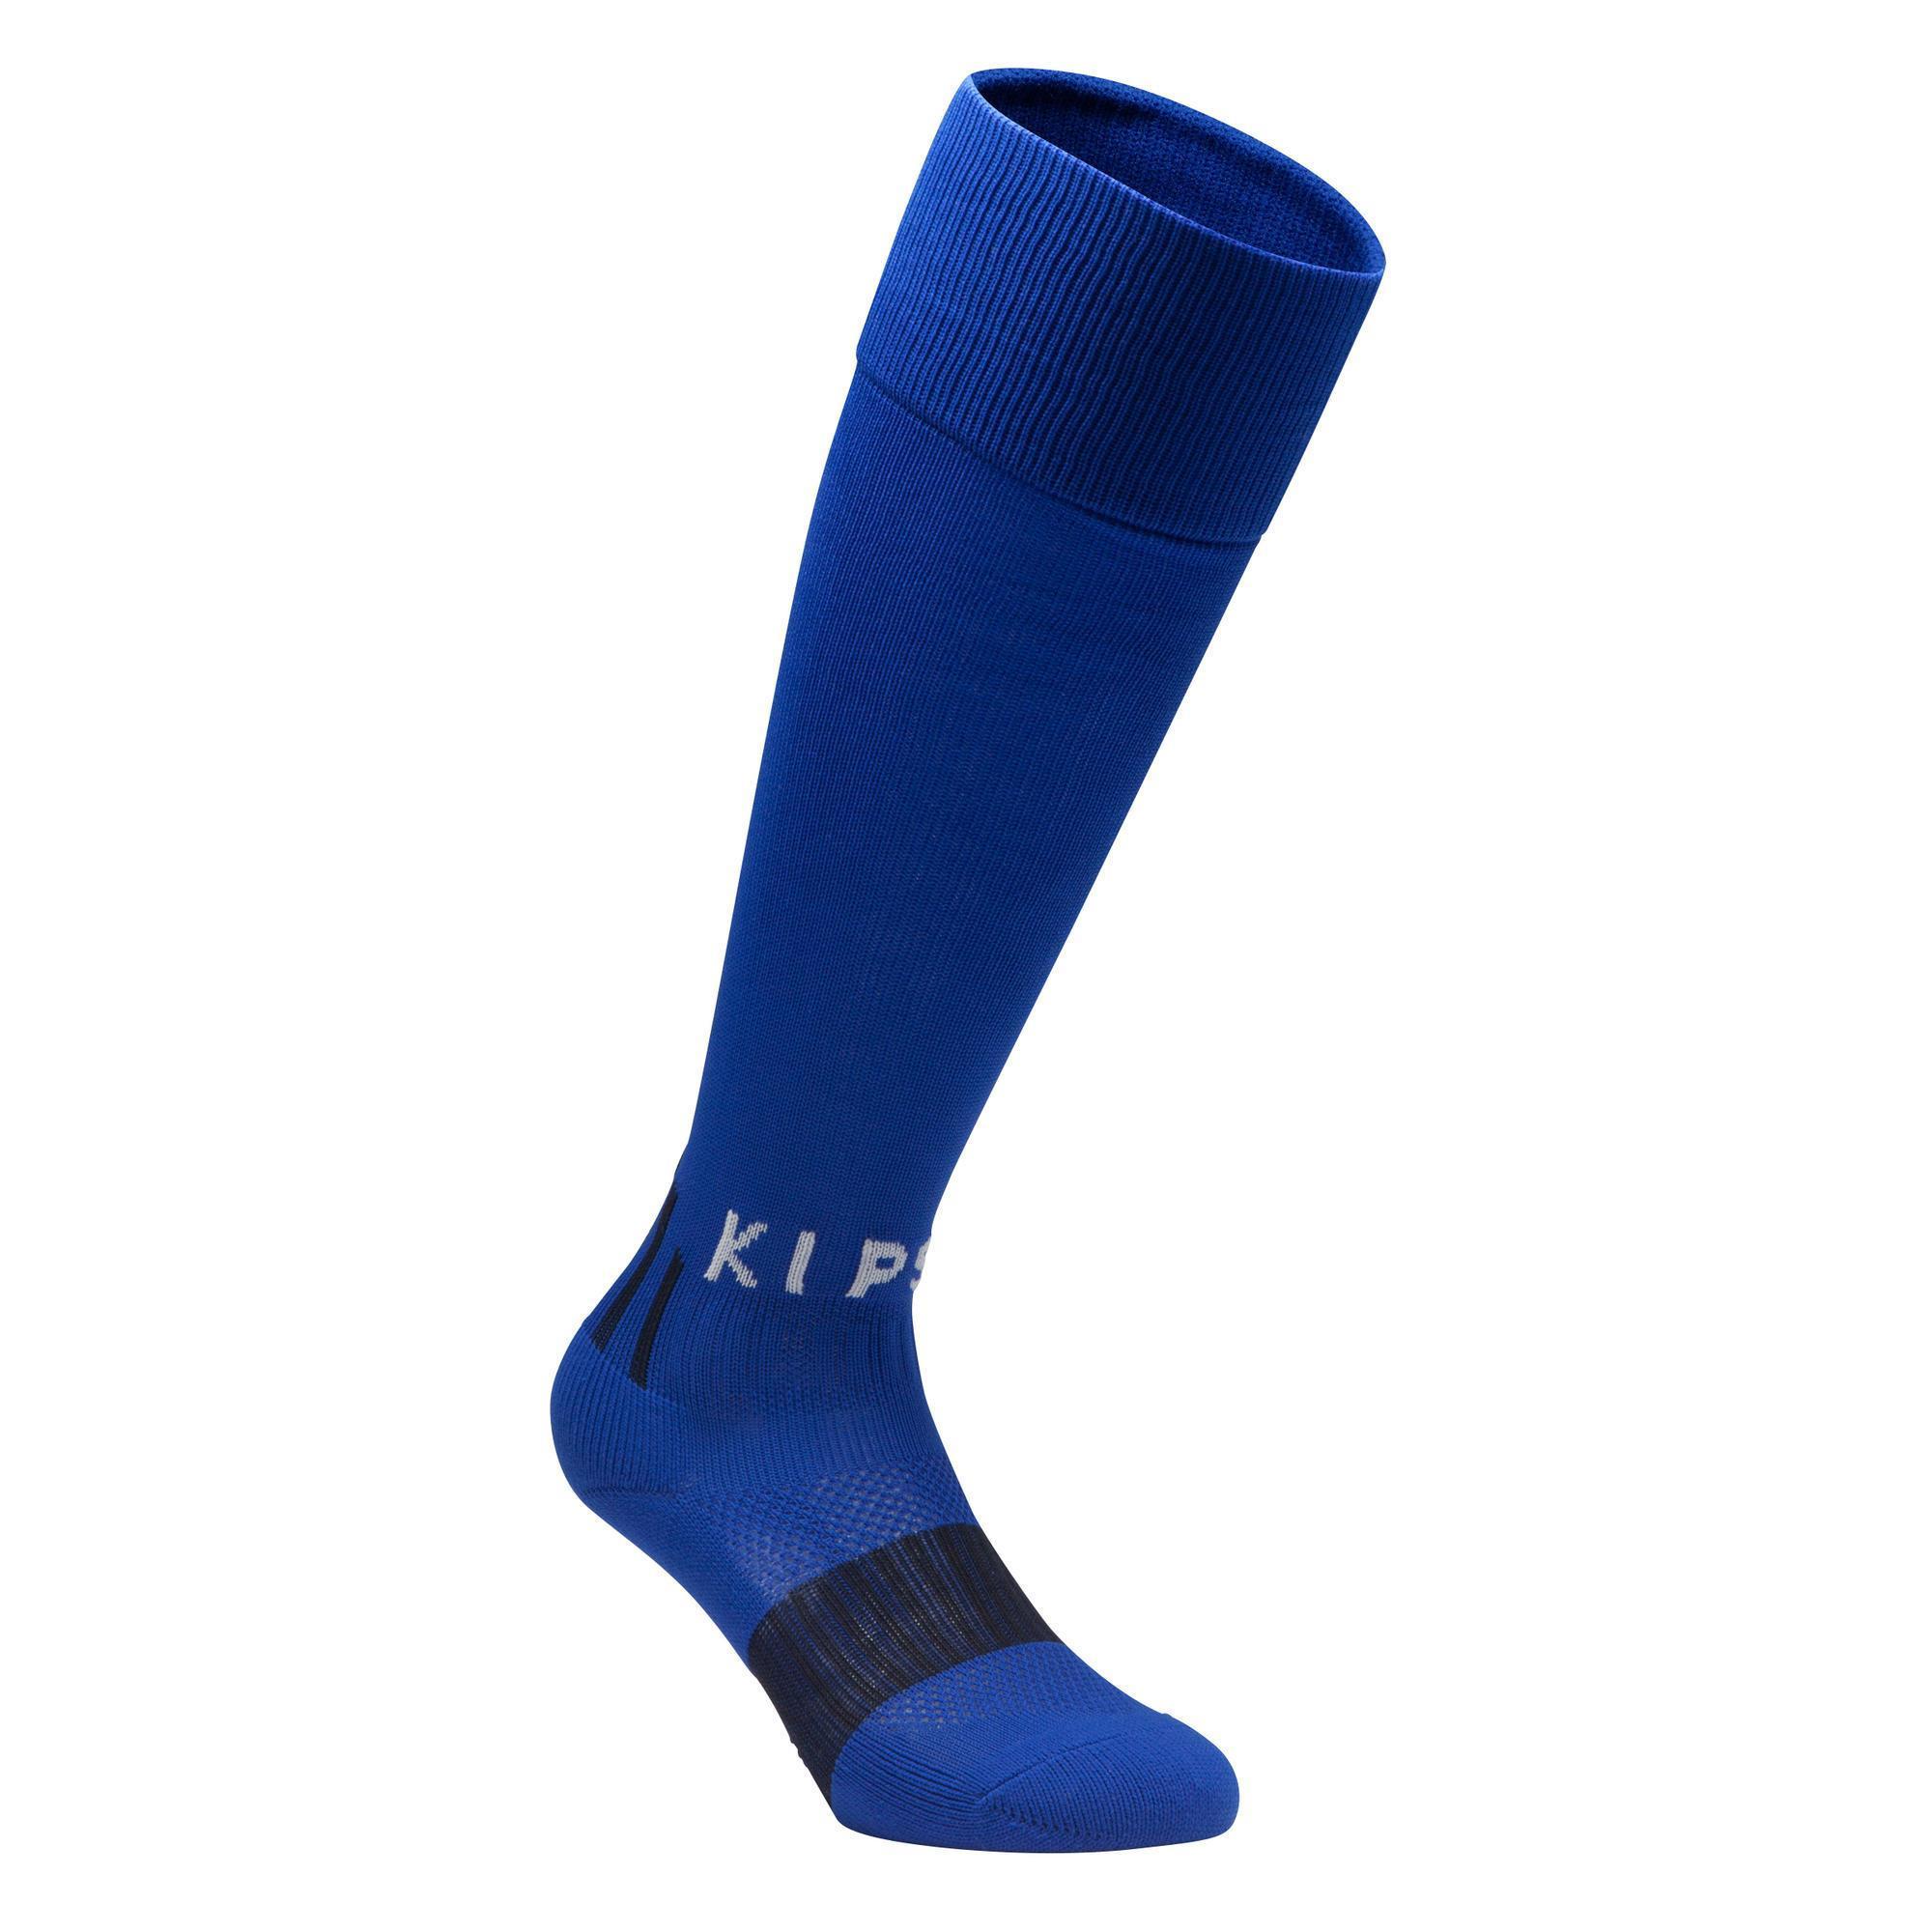 Kipsta Voetbalsokken / voetbalkousen kind F500 indigo